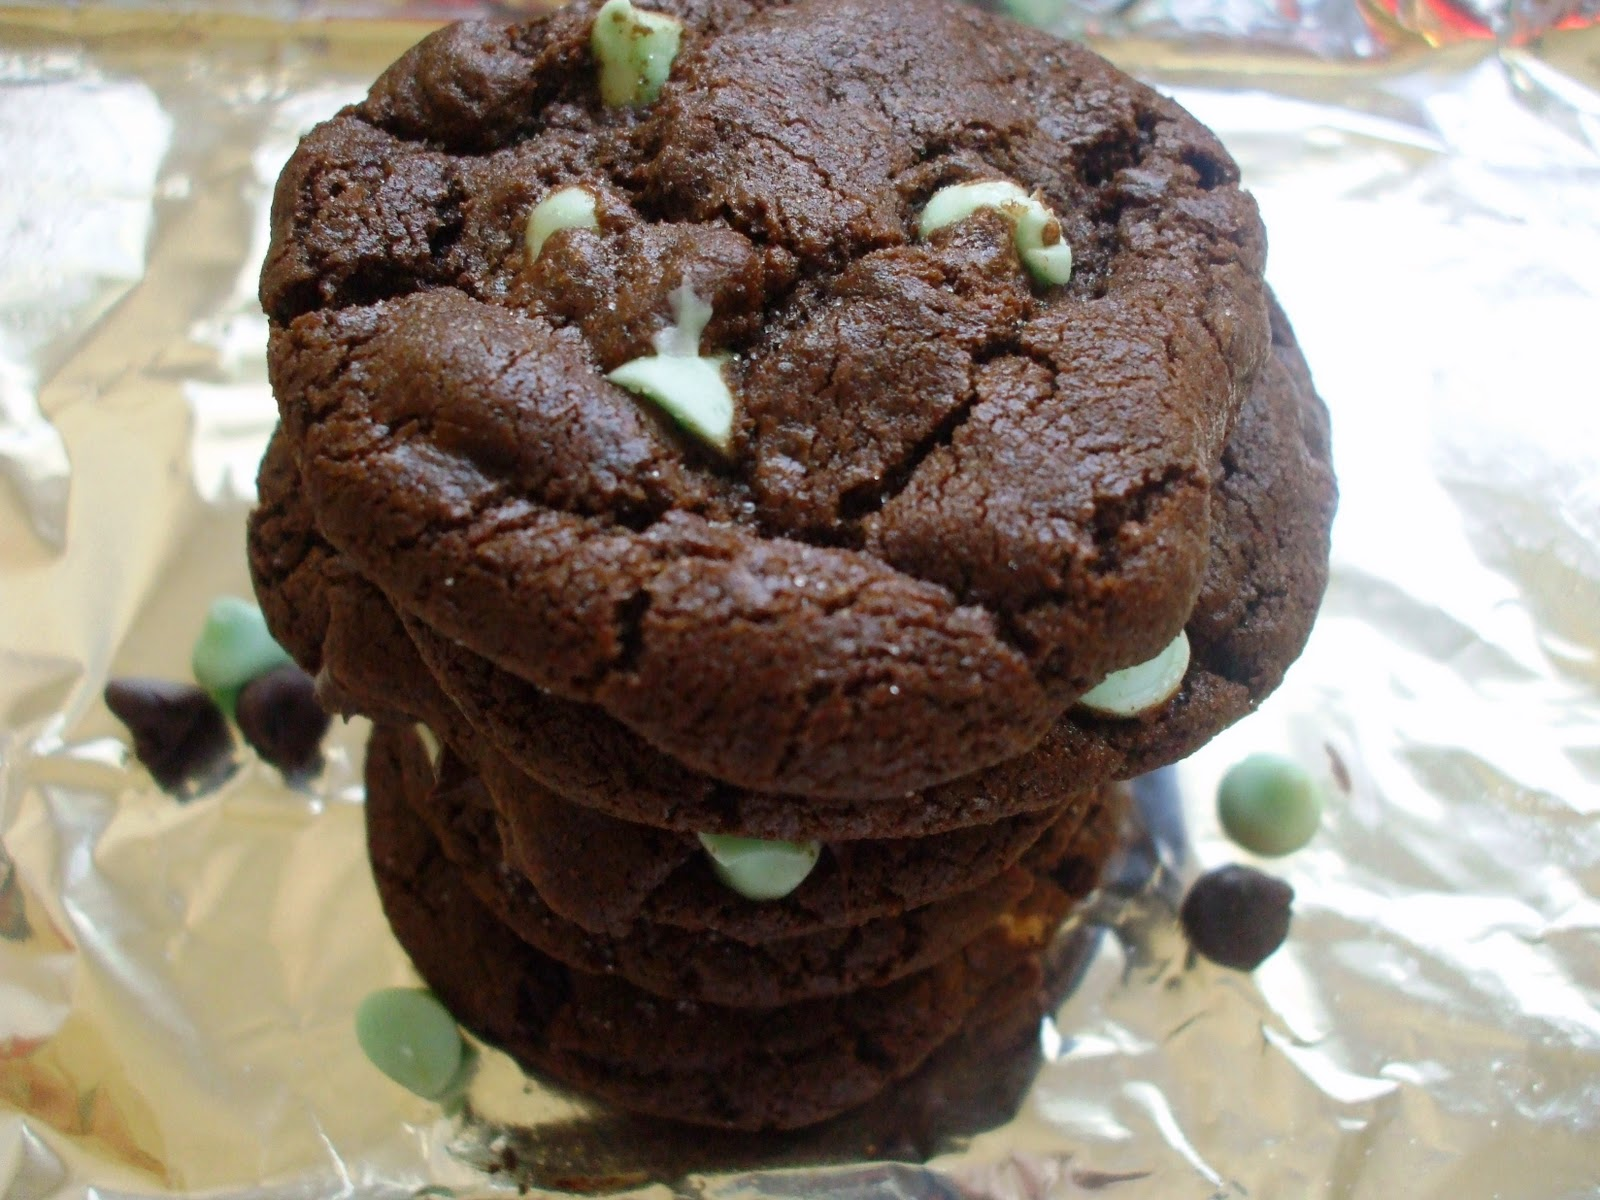 Sinful Sundays: Mint Chocolate Chip Cookies